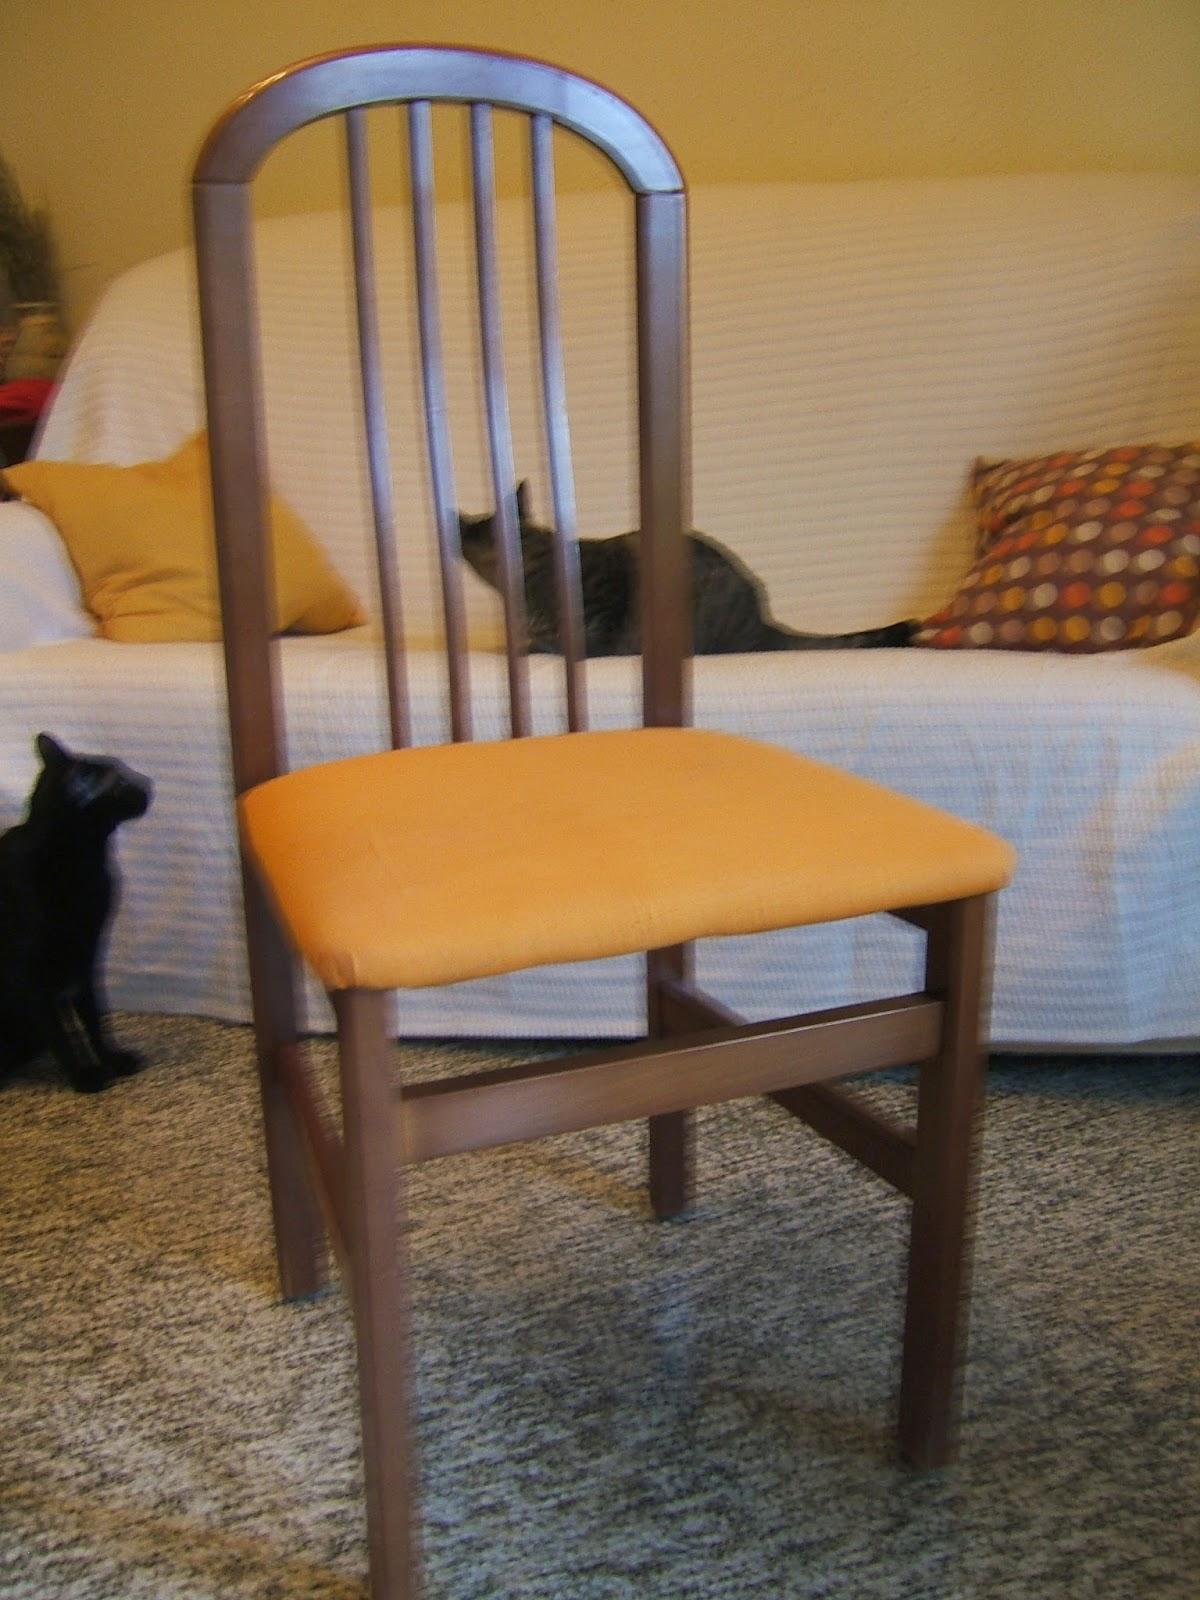 Best tela para tapizar sillas de comedor photos casa - Tela para tapizar sillas ...